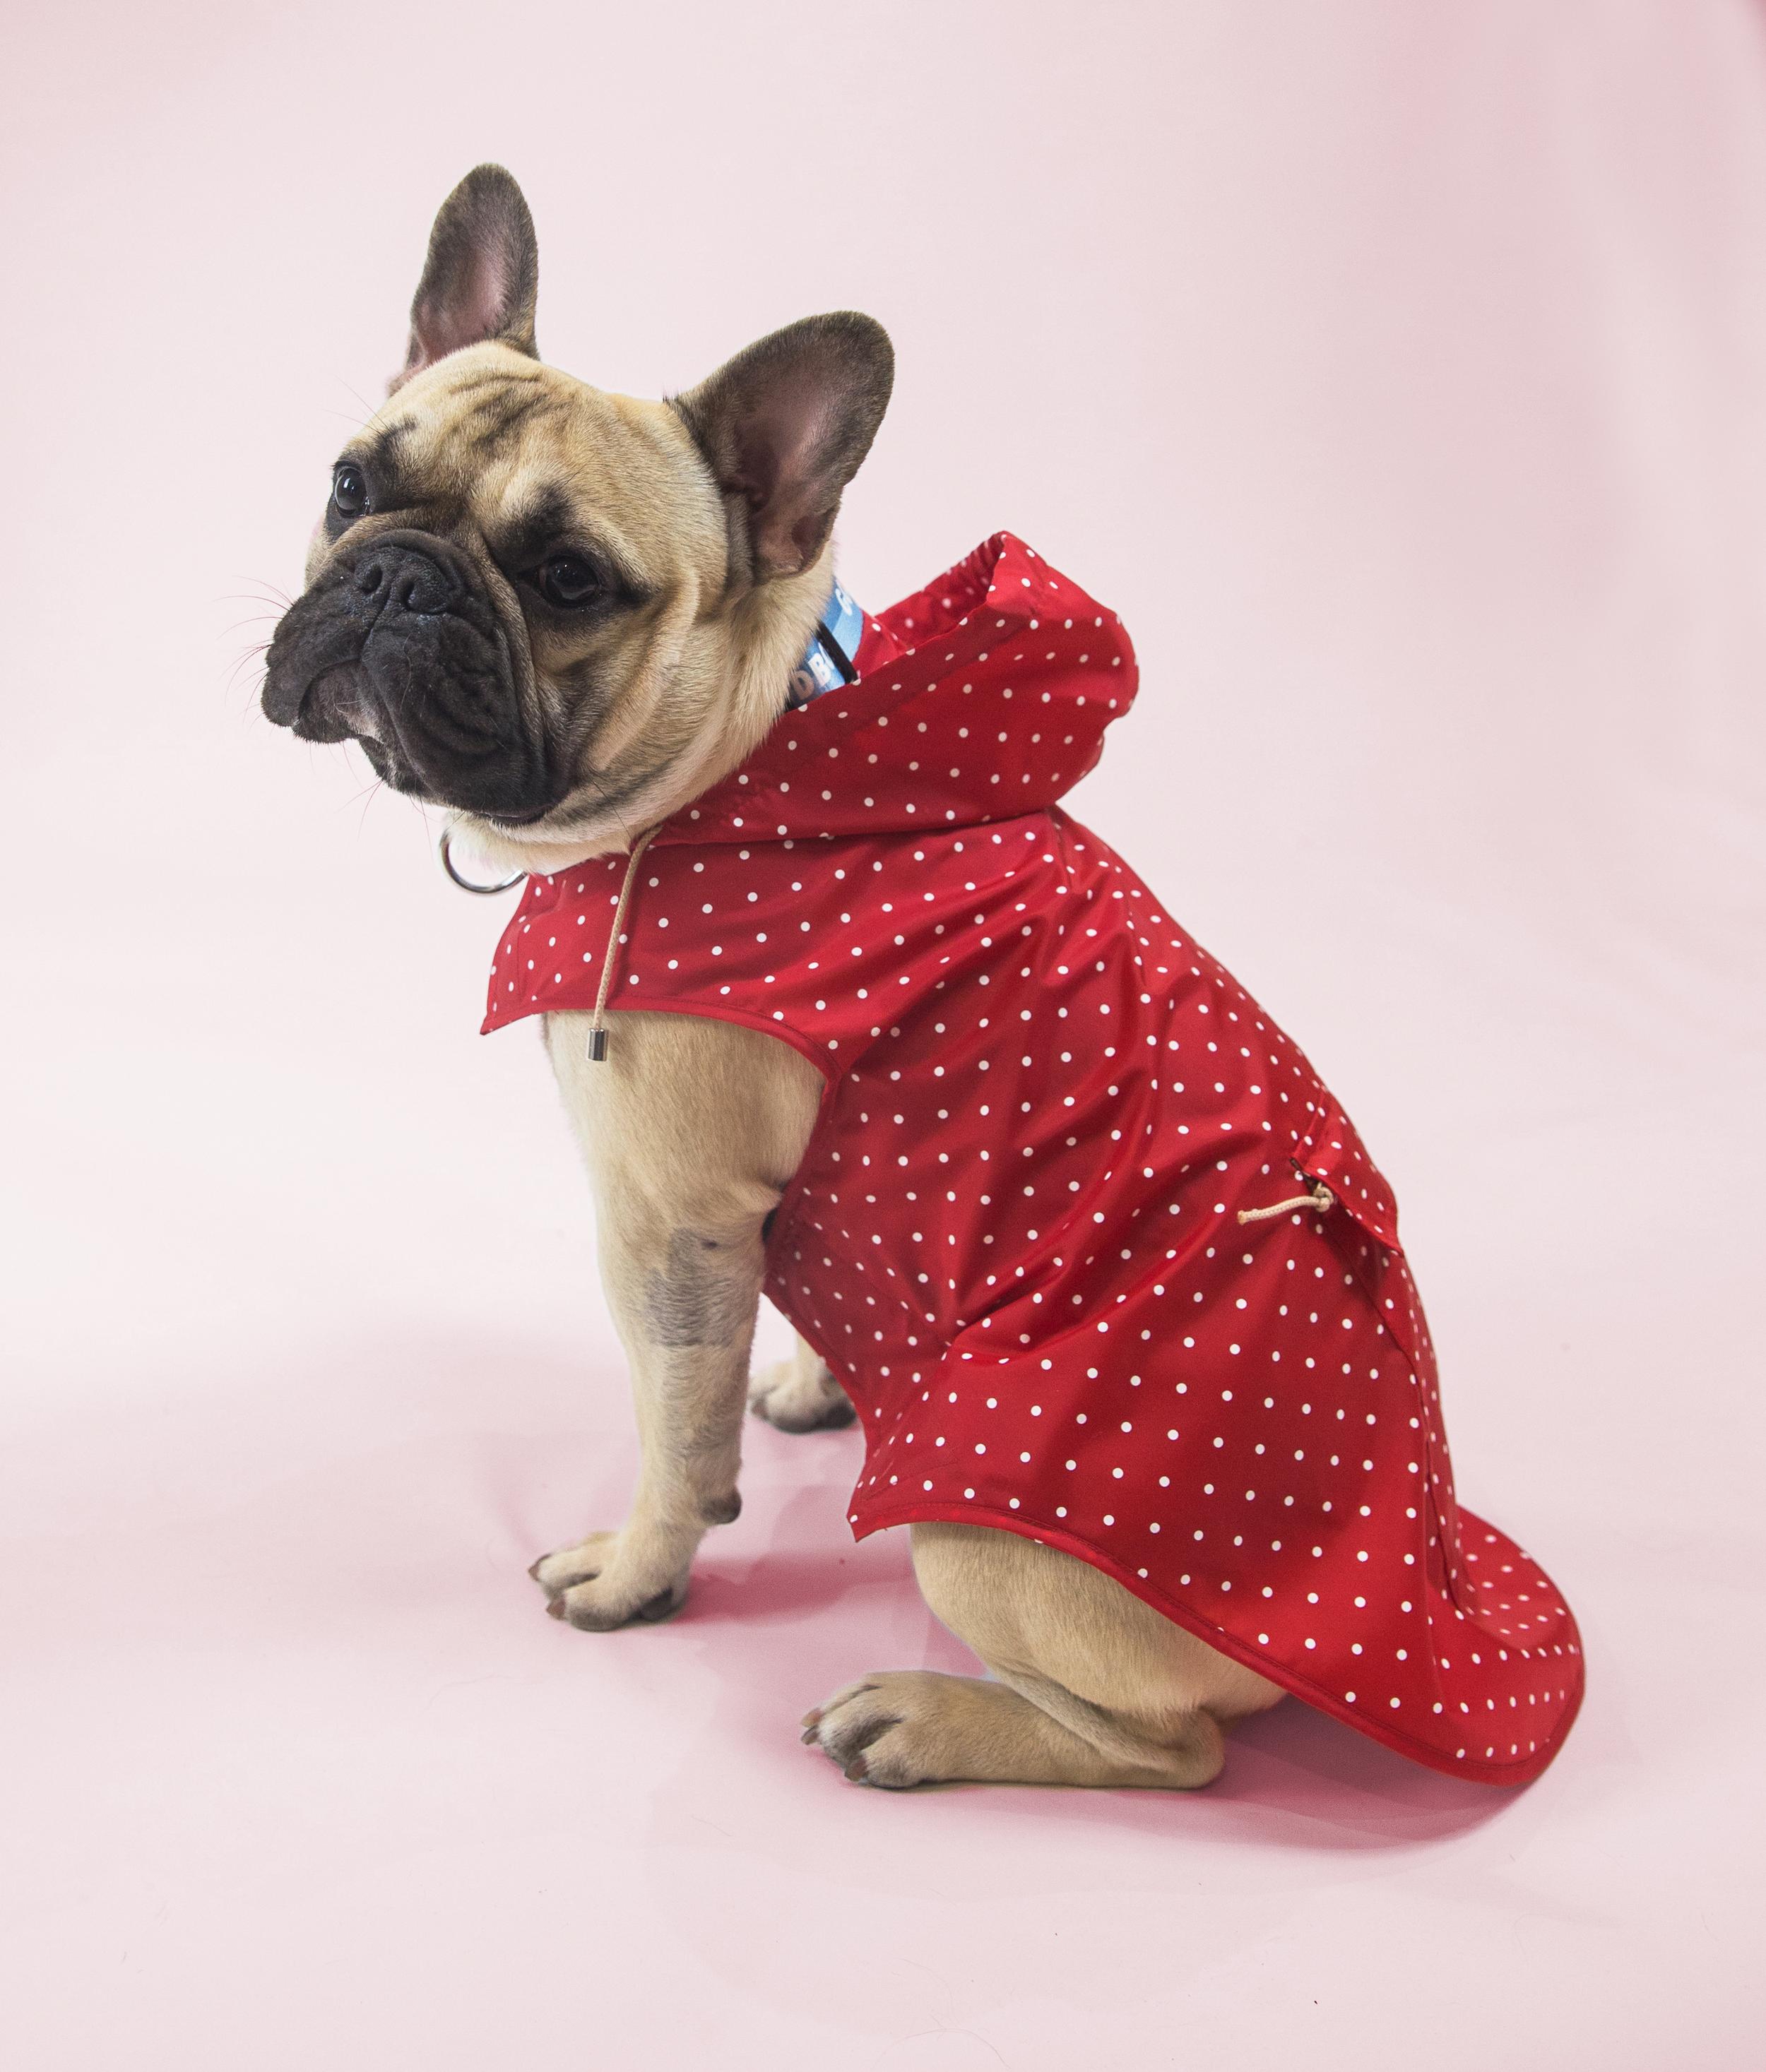 Meet Sir Chad. - Age: 1 yearBreed: French BulldogHometown: Toronto, Ontario